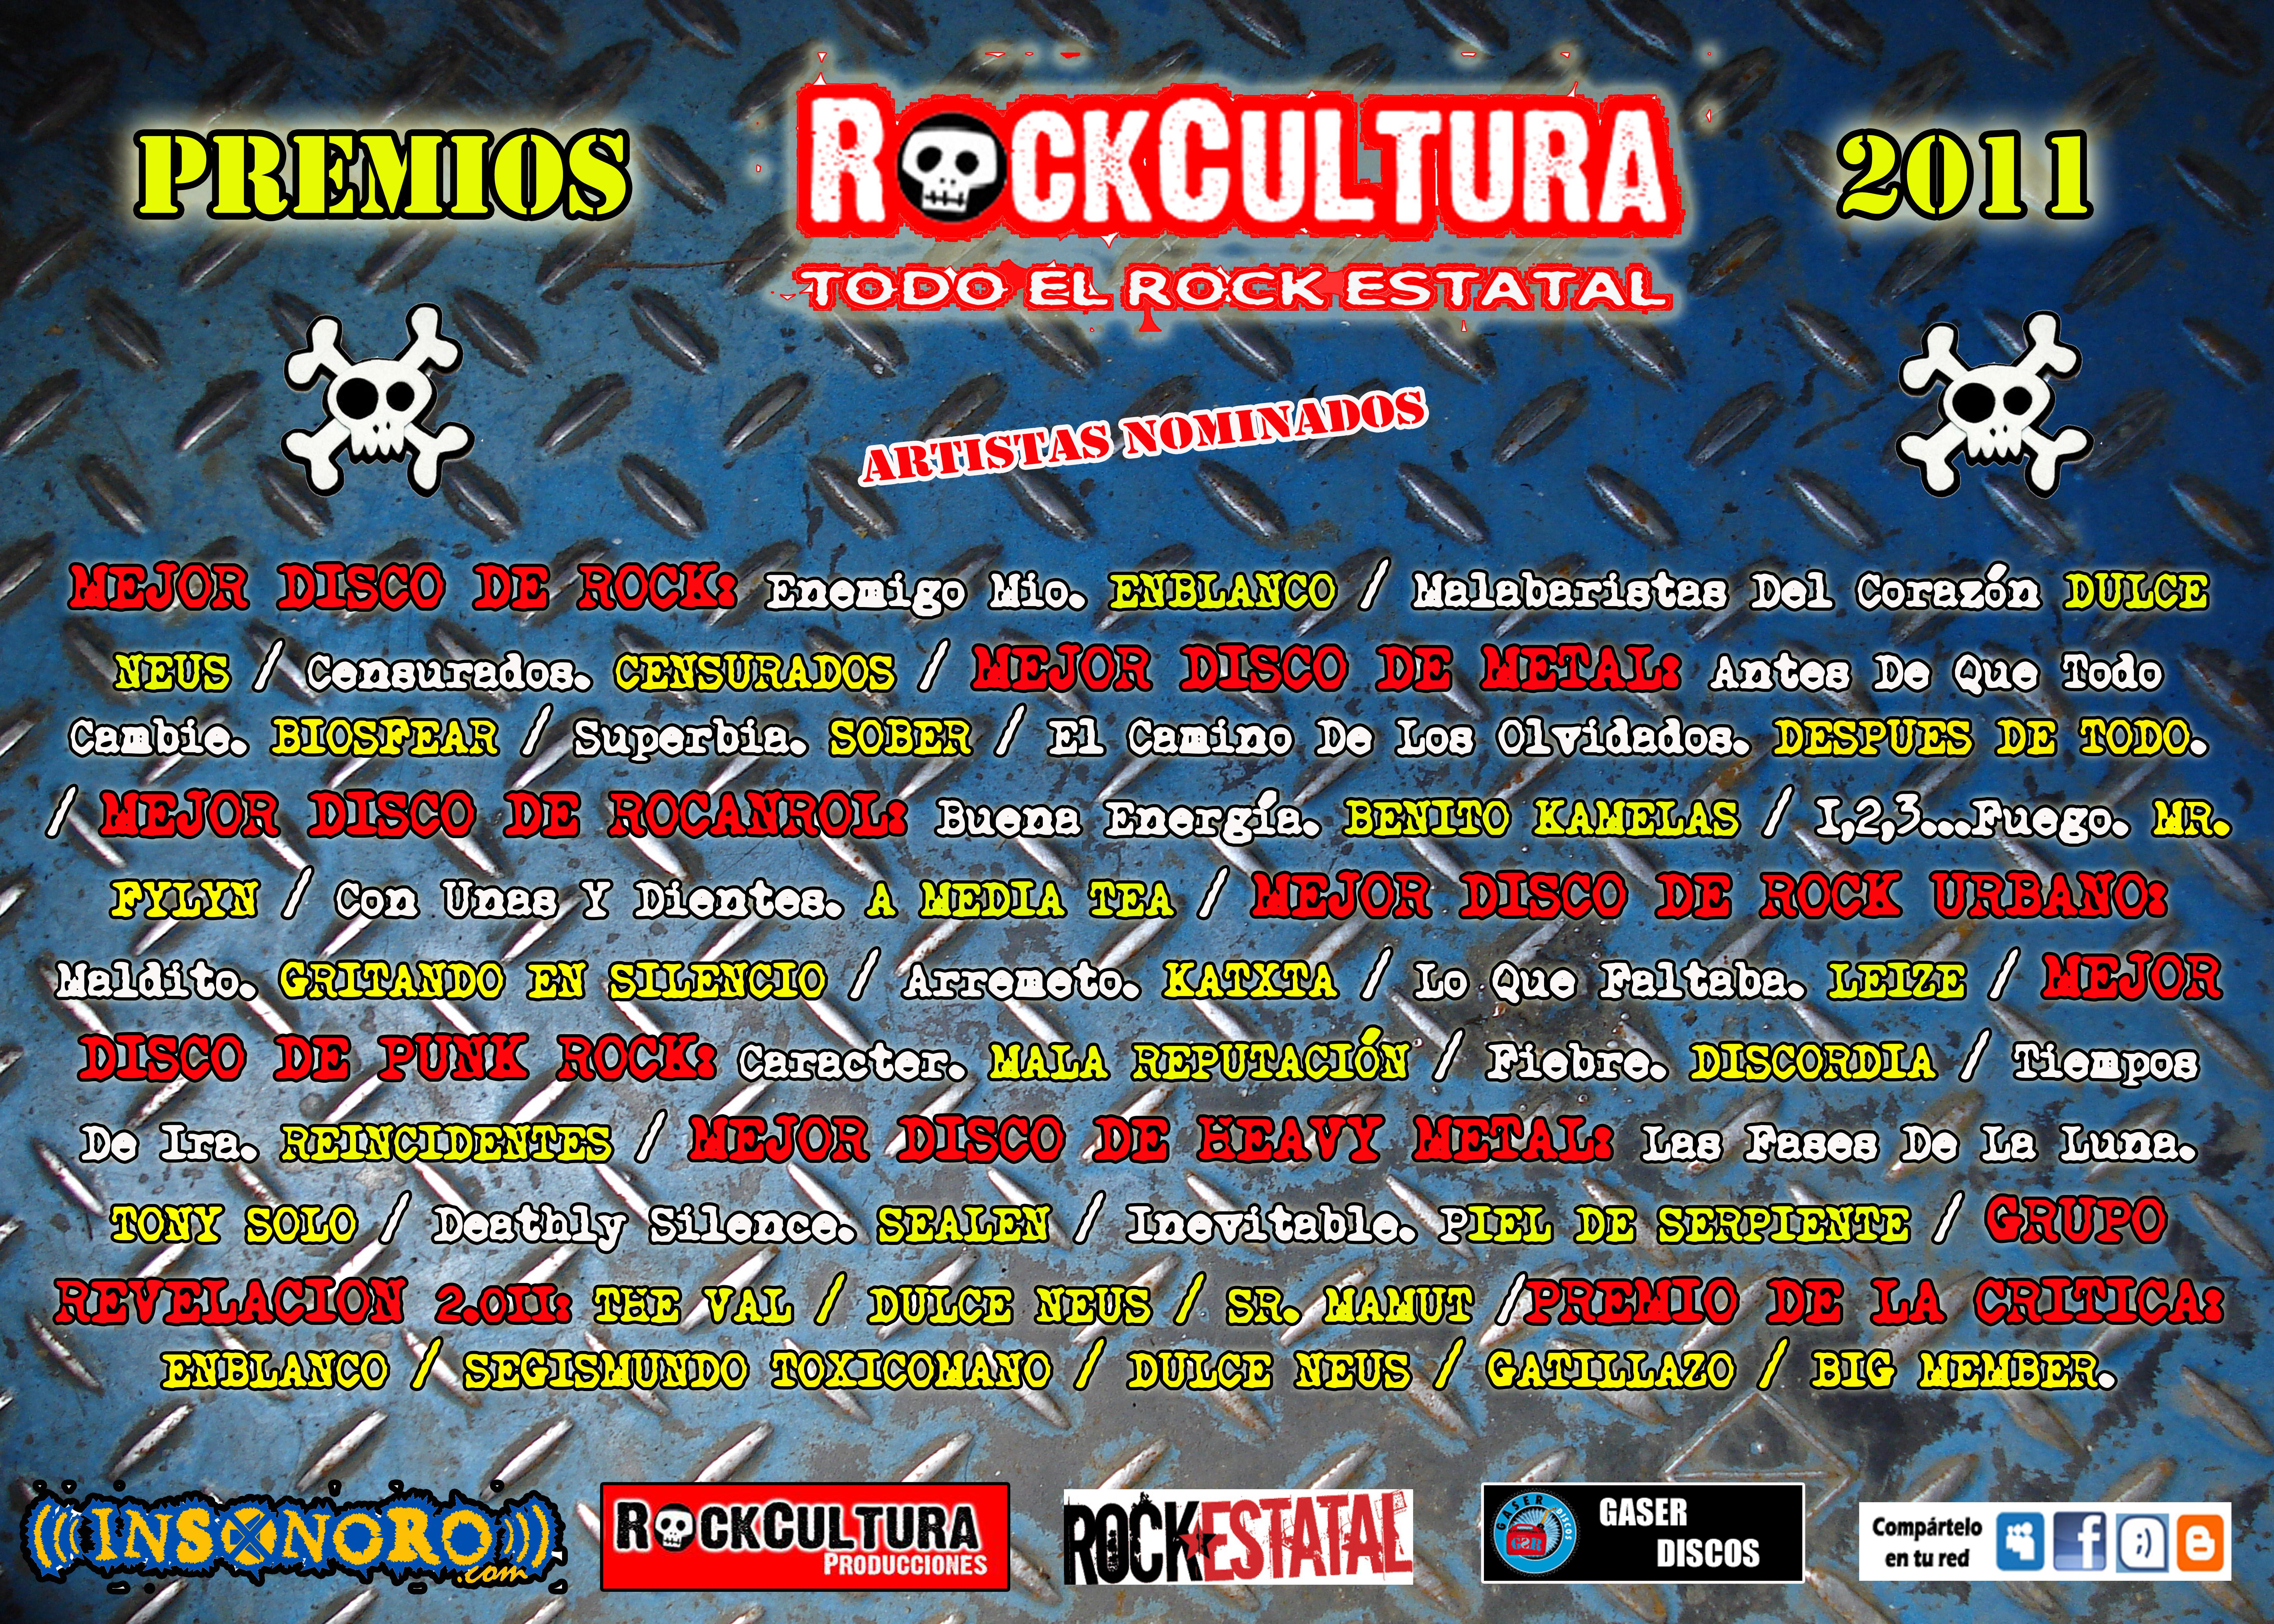 PREMIOS ROCKCULTURA 2011